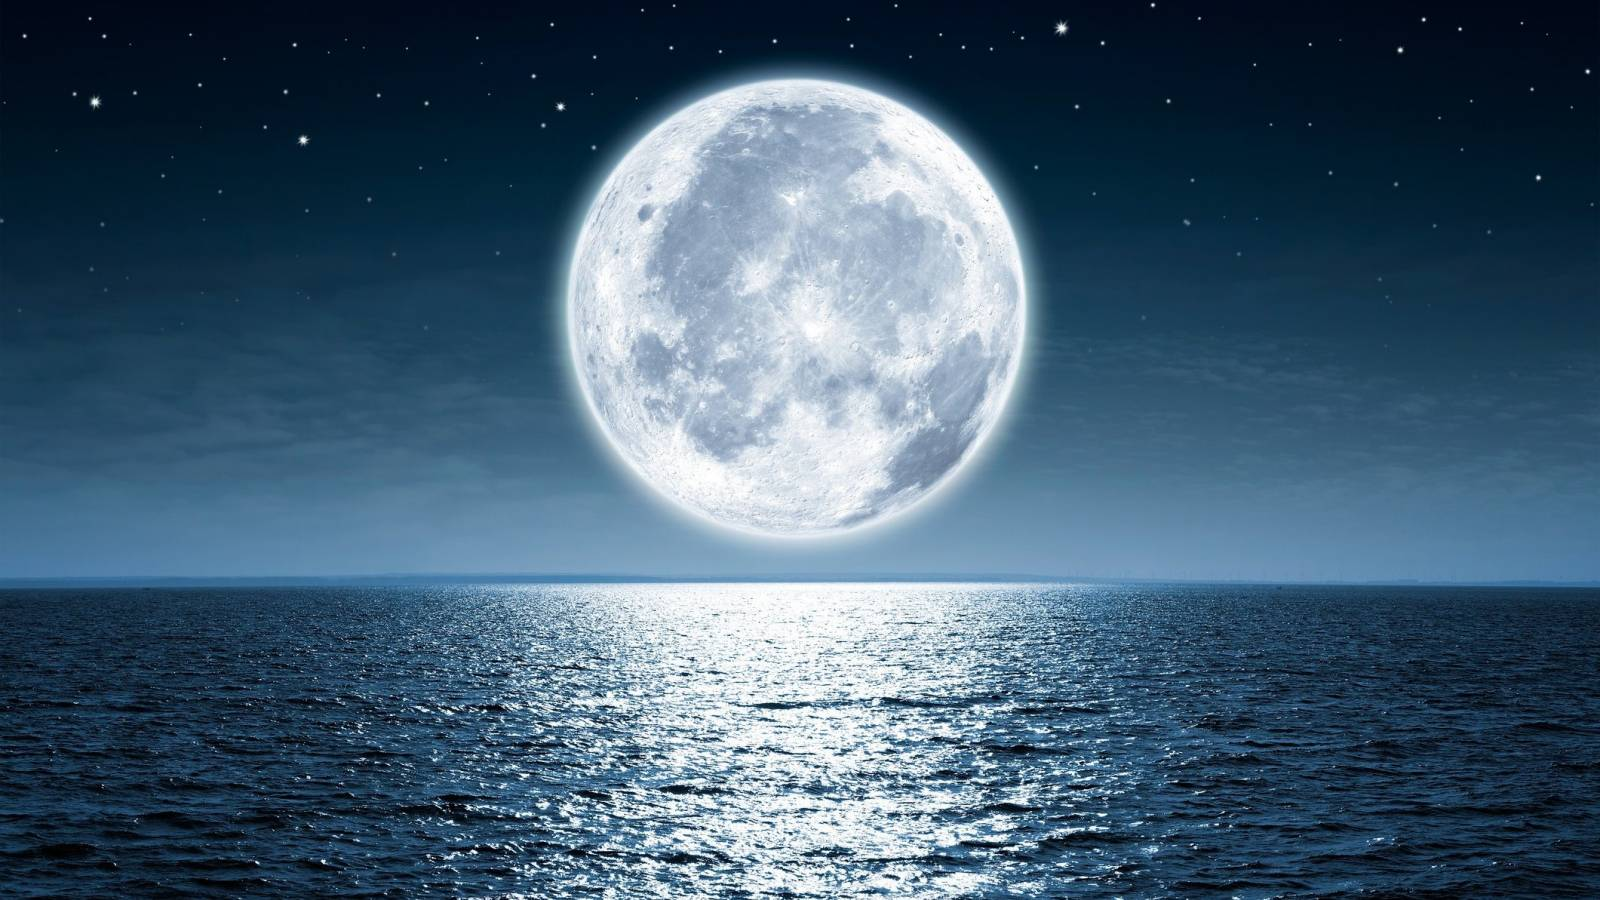 luna clor